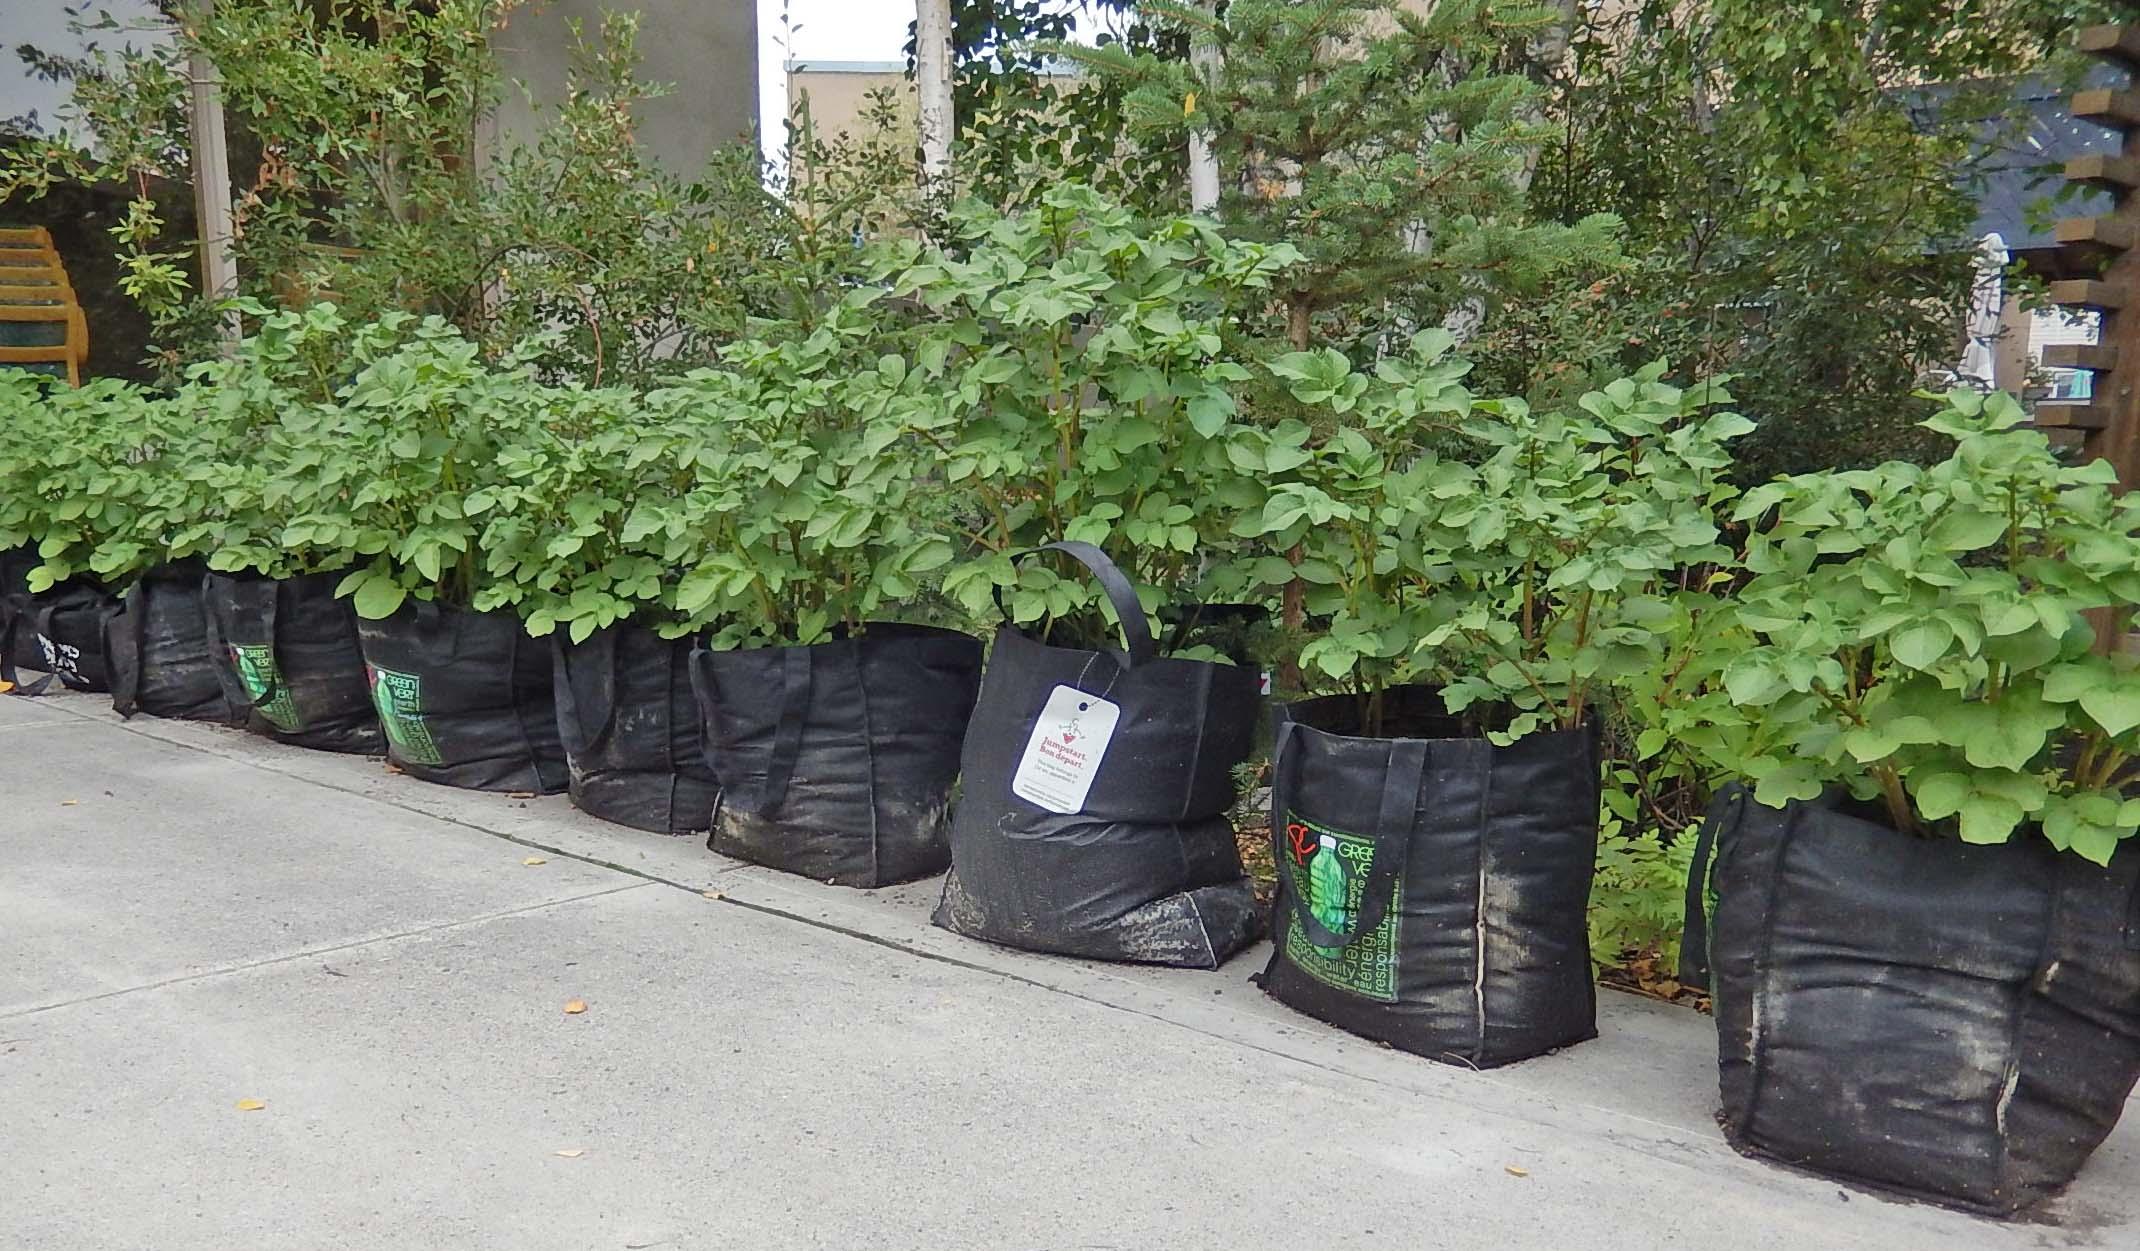 bags of potatoes.jpg